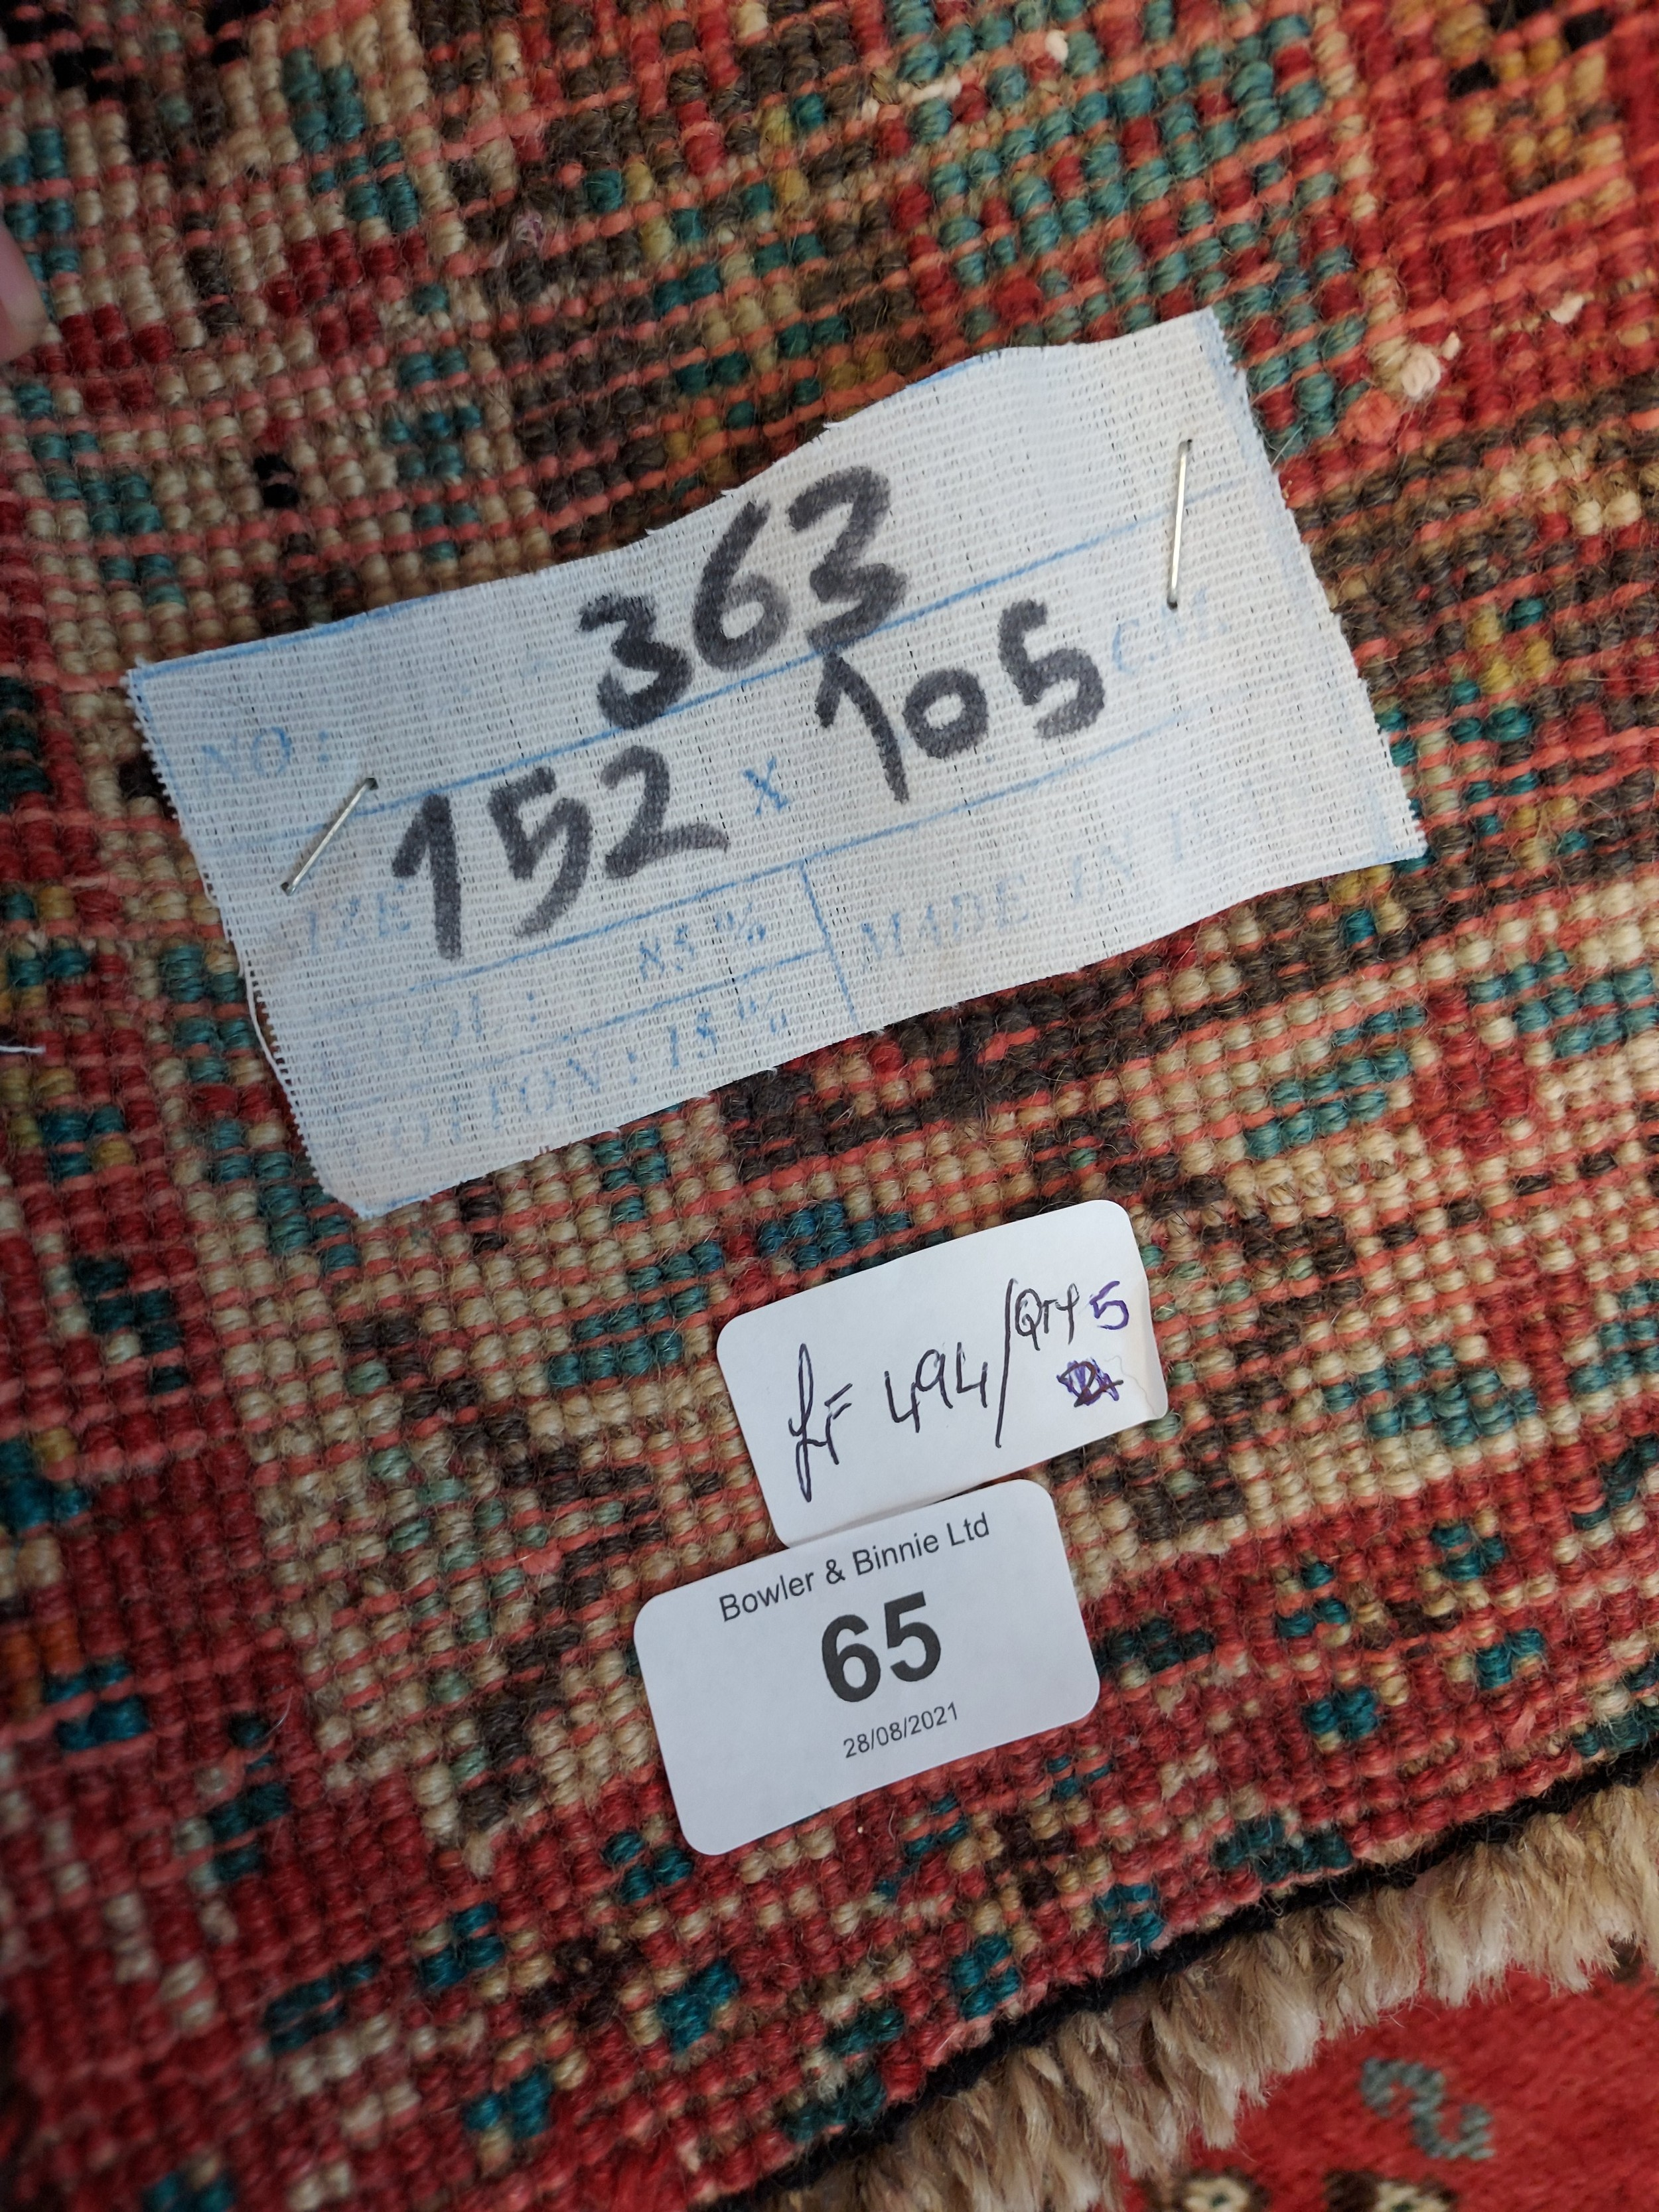 A handmade Iranian ornate rug [152x105cm] - Image 3 of 3